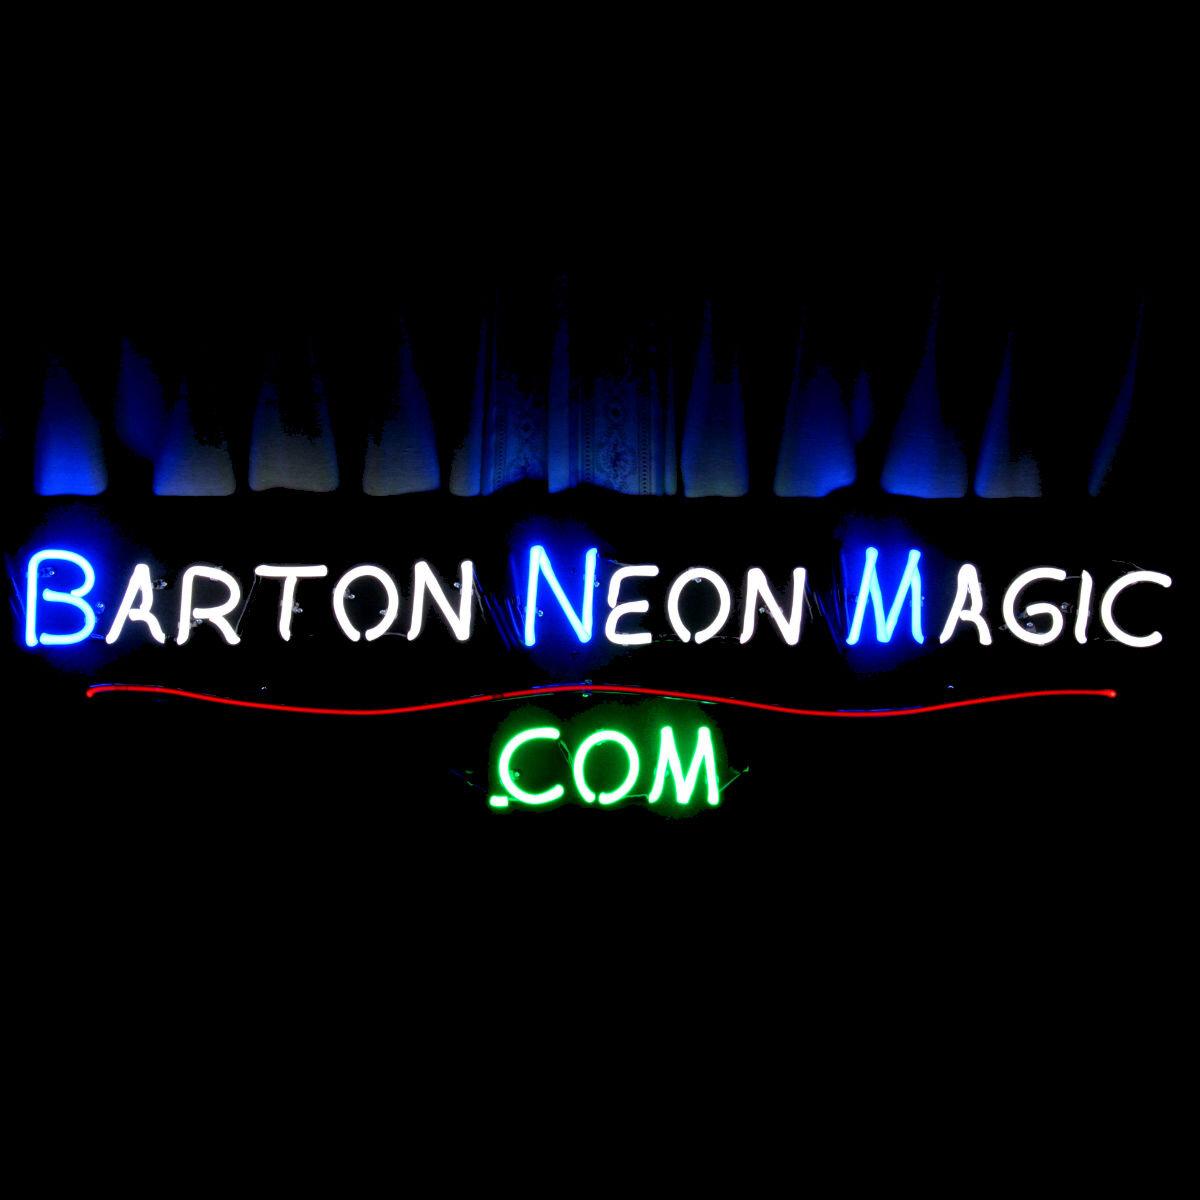 BARTONNEONMAGIC.COM - CUSTOM DOG AND CAT NEON LIGHT ARTWORKS by John Barton